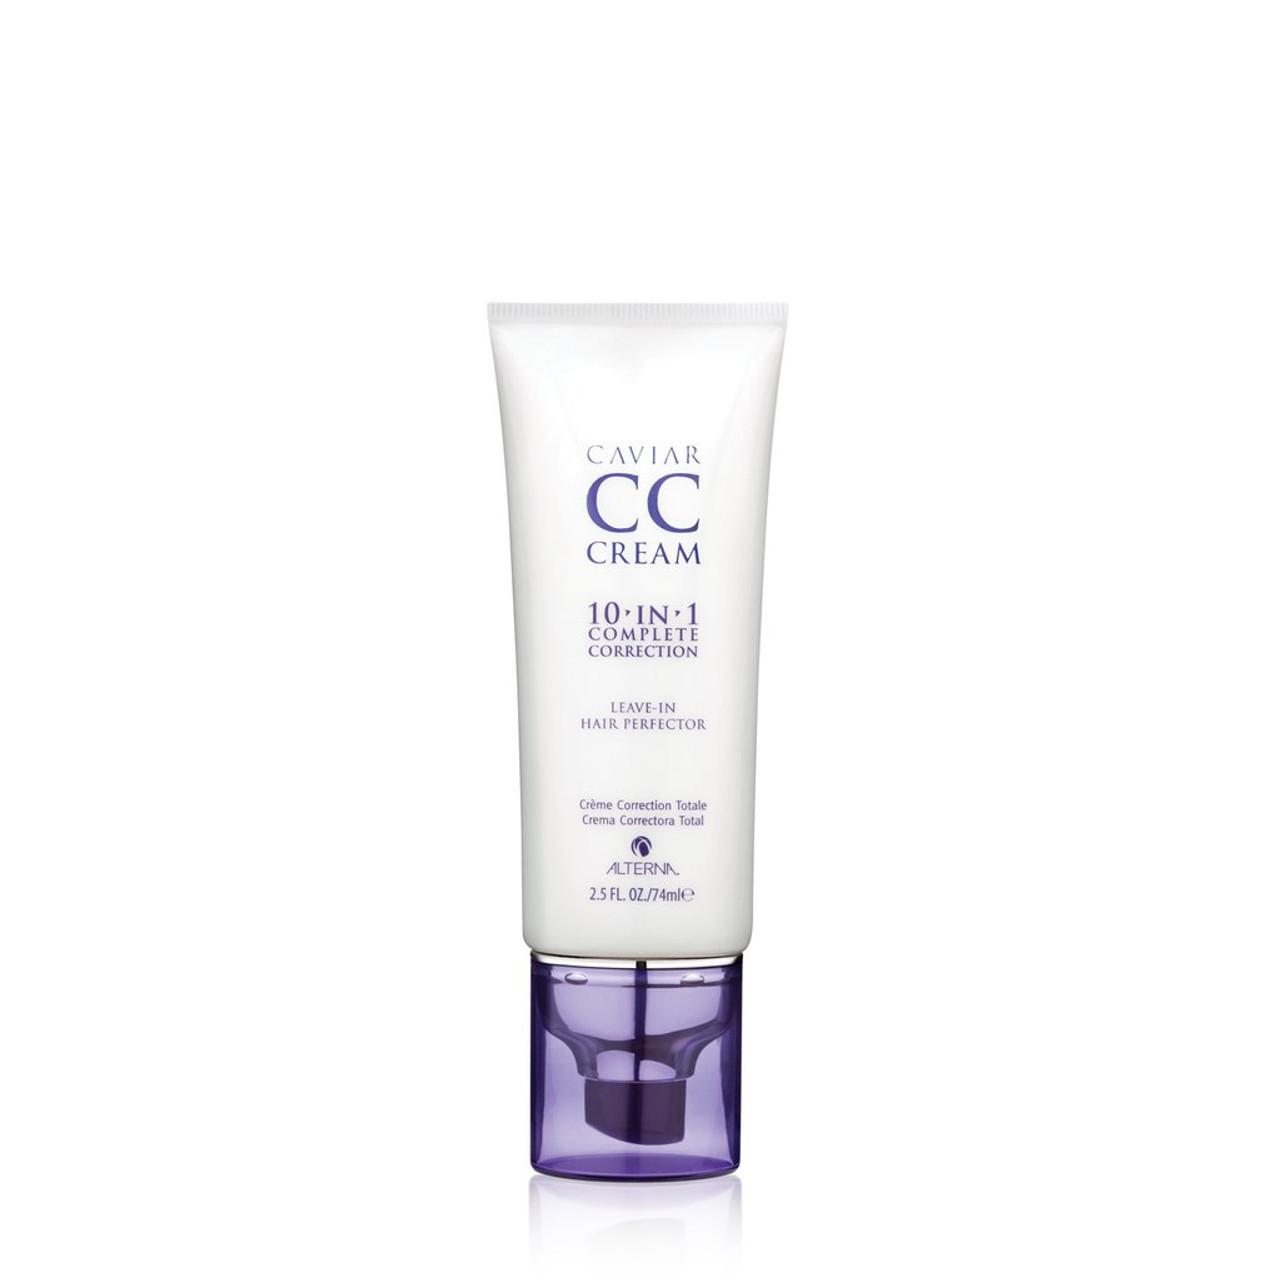 Alterna Caviar CC Cream, 2.5 fl oz (74 ml)